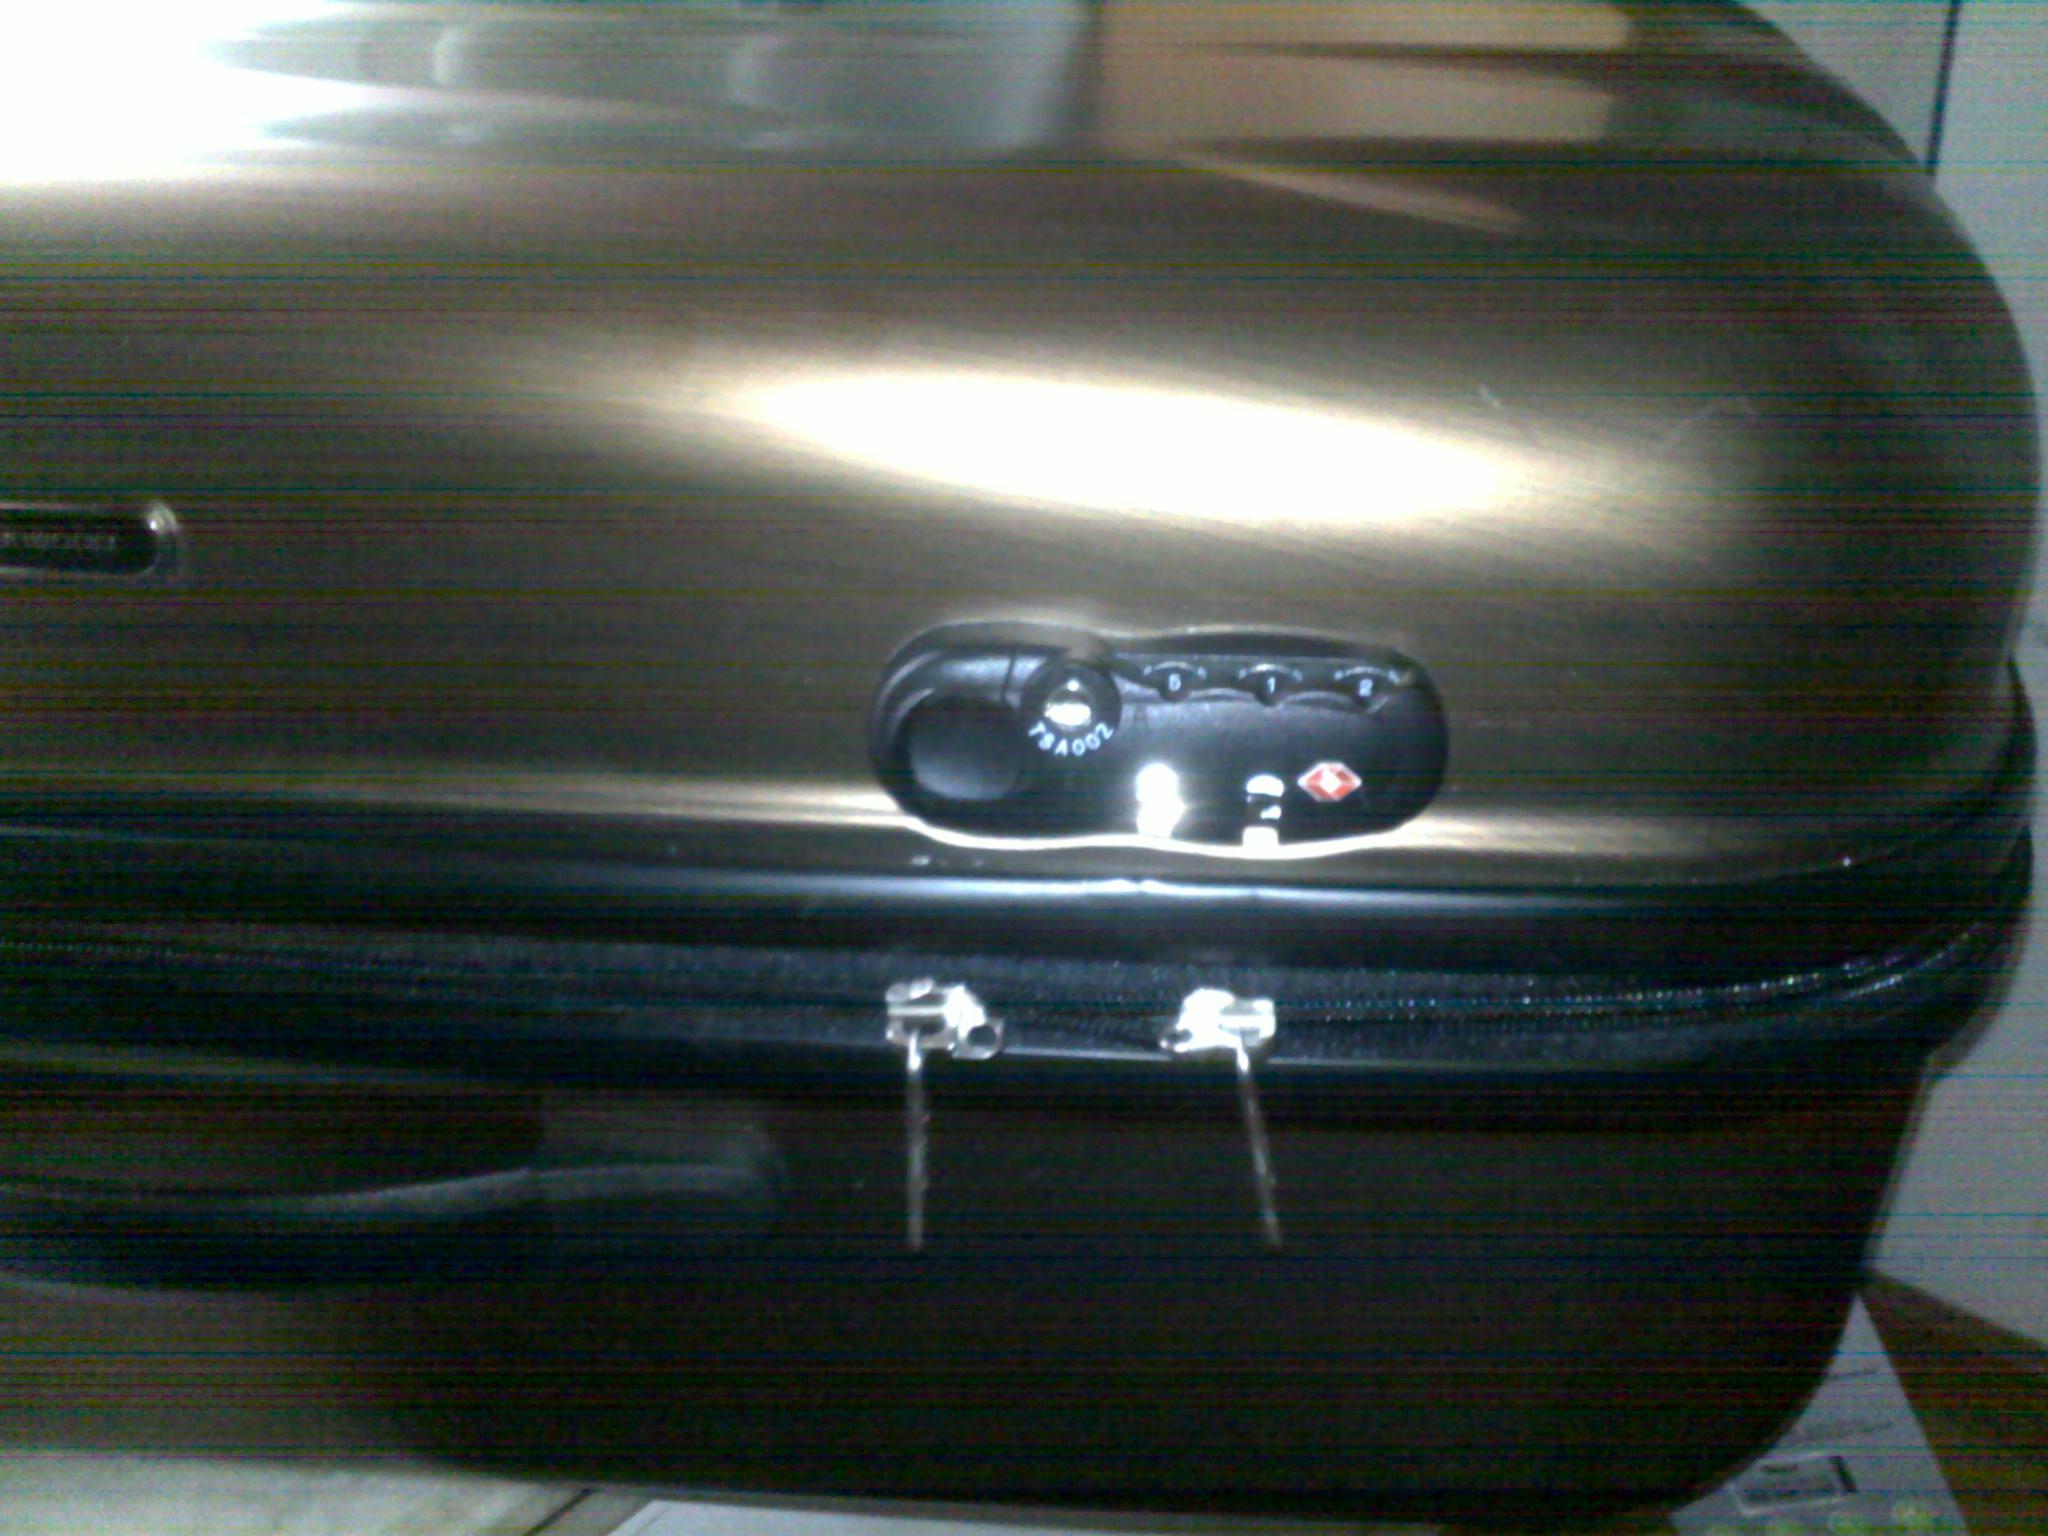 designer handbags discount 00230525 forsale